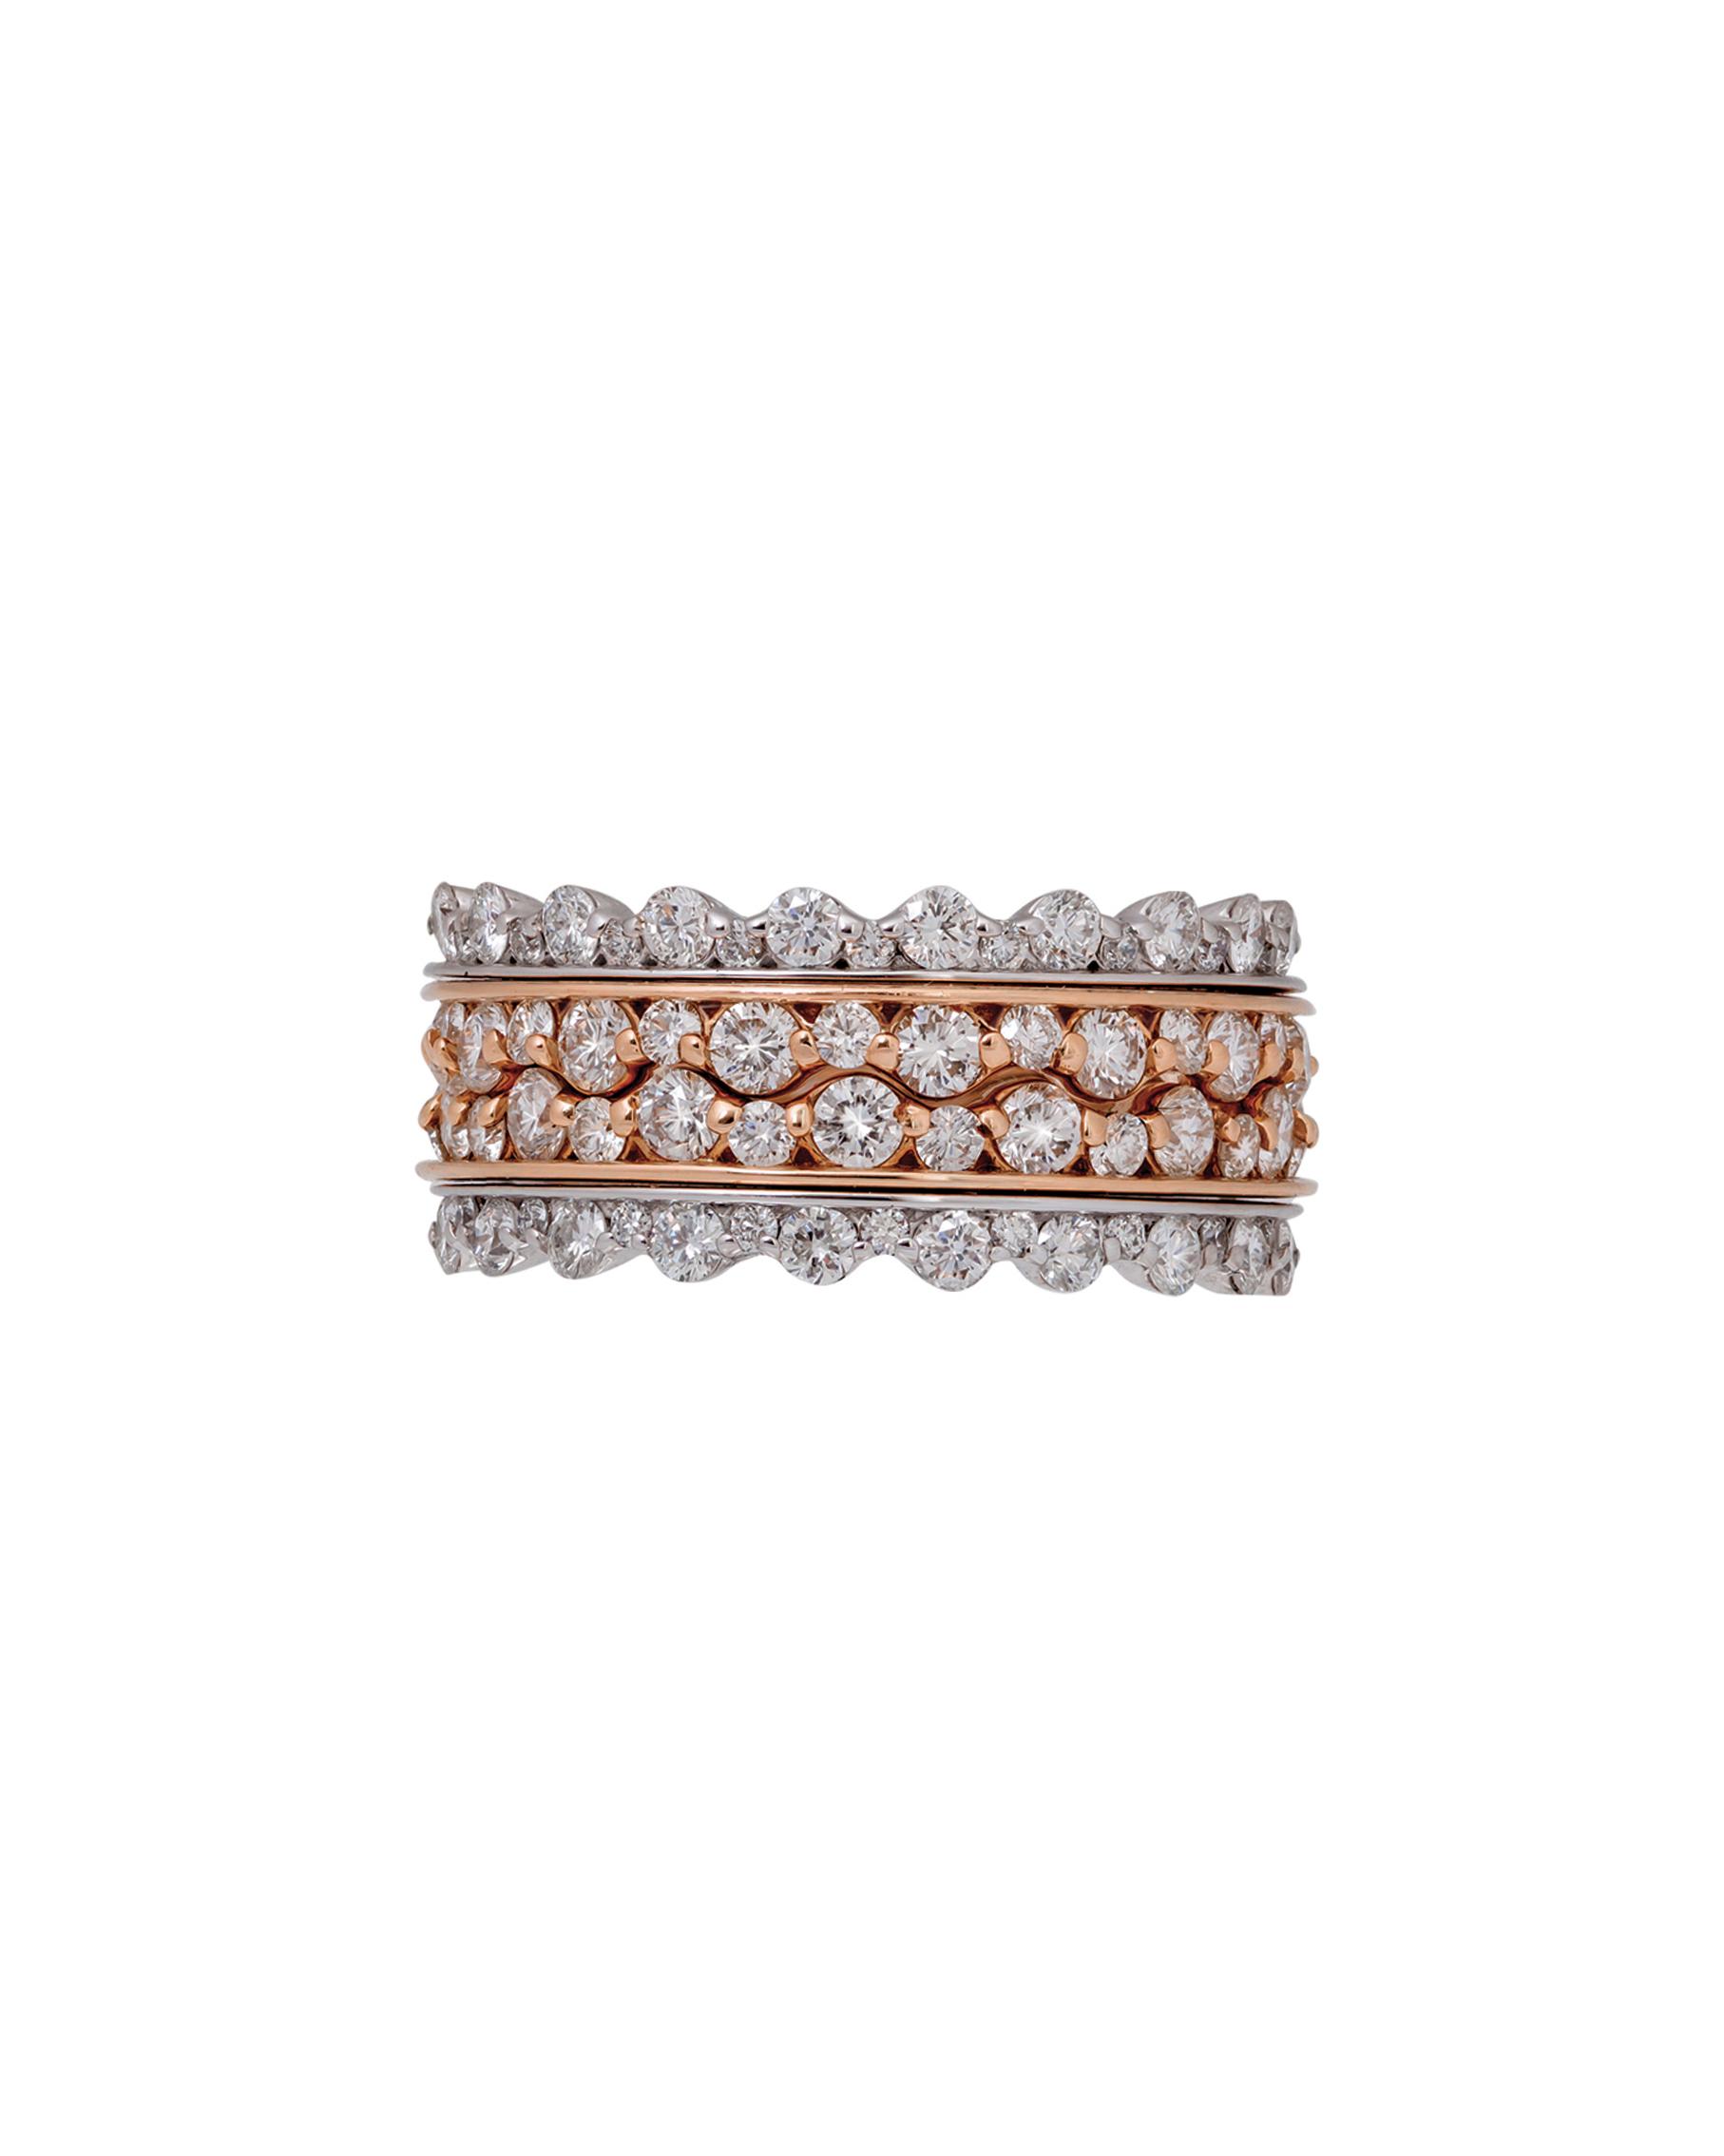 designer diamond bridal jewelry-1-4.jpg